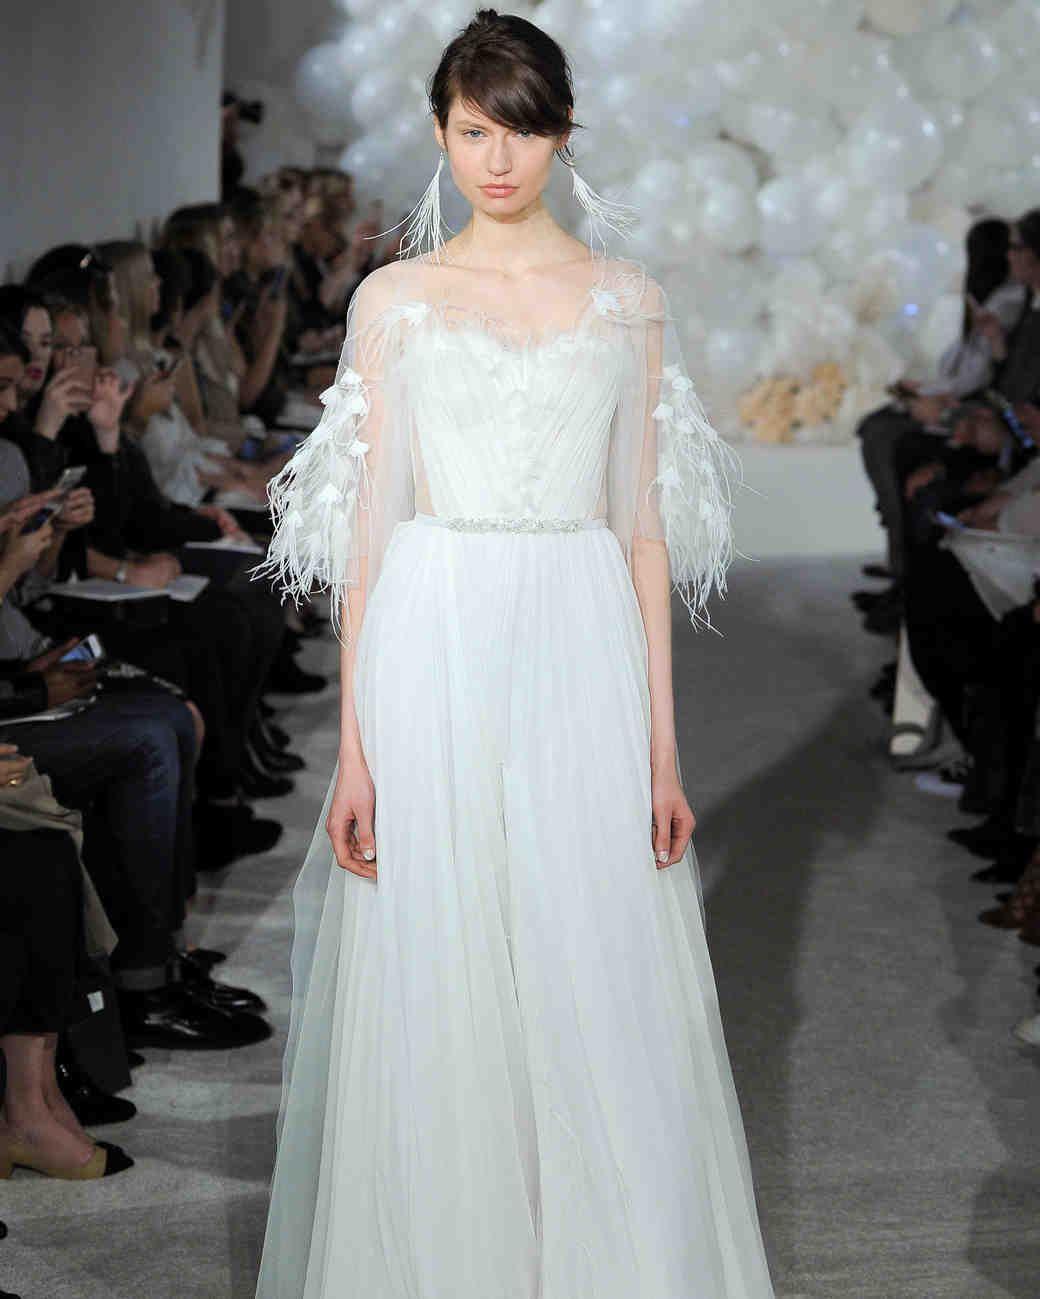 5592103b43b3 Mira Zwillinger Spring 2018 Wedding Dress Collection | Martha Stewart  Weddings – Pastel blue A-line wedding dress